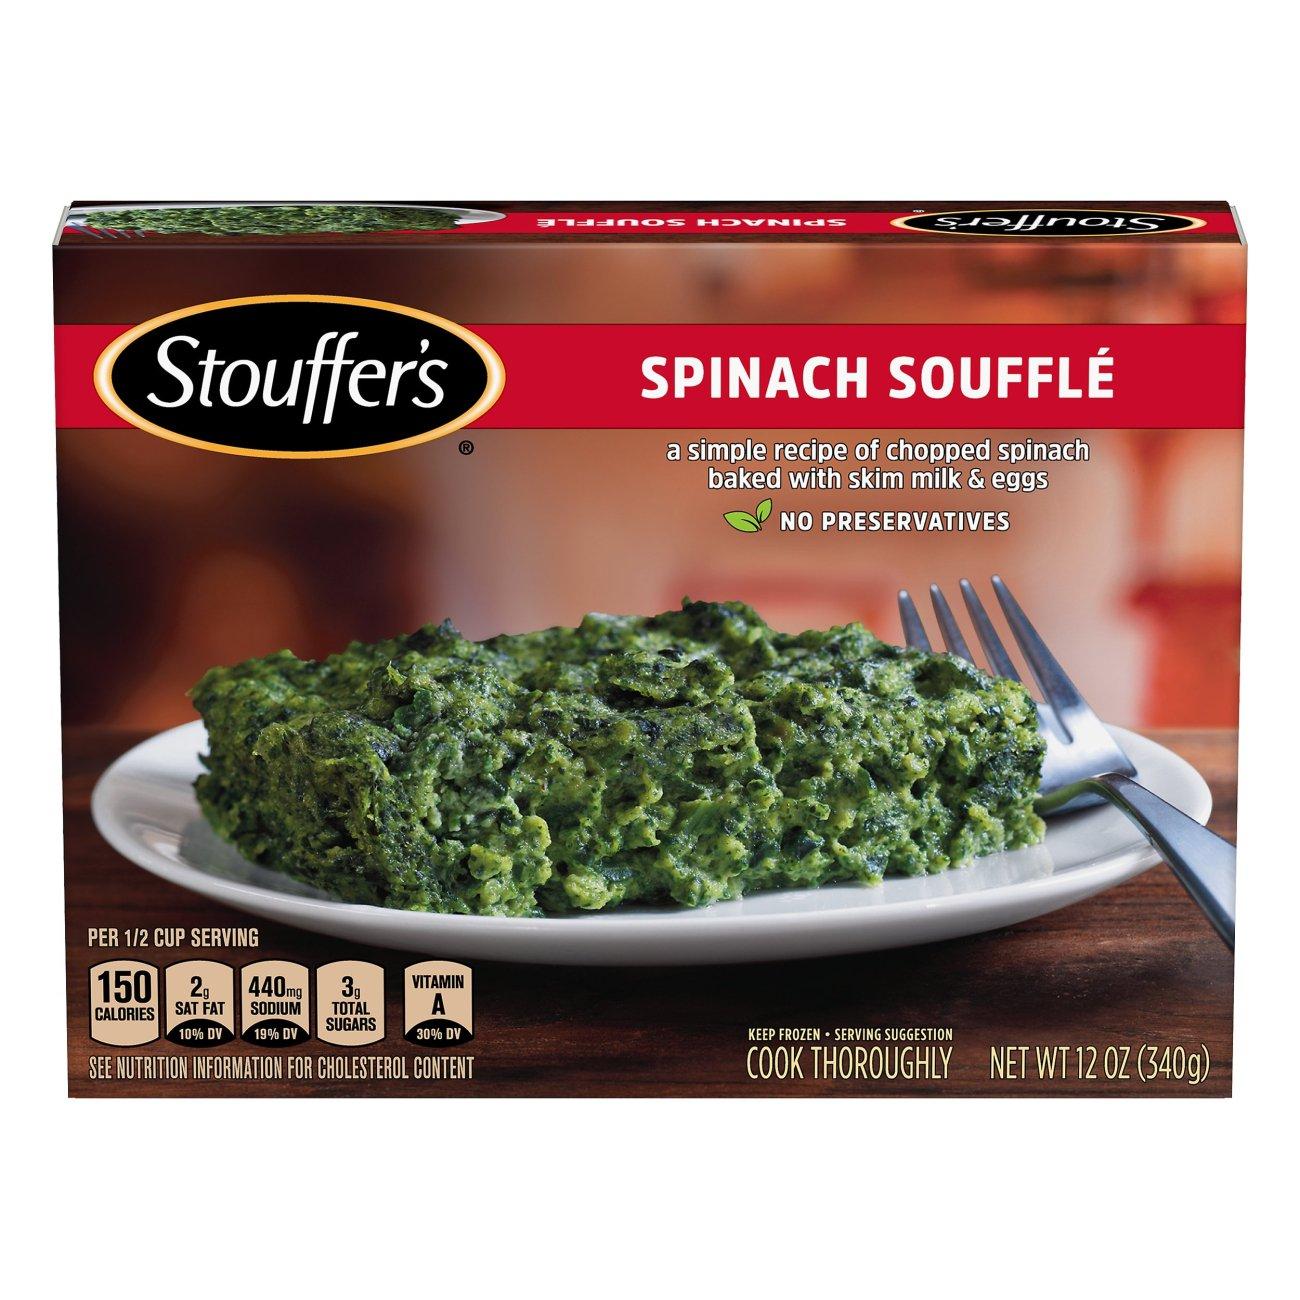 stouffer's craveable recipes spinach souffle ‑ shop single meals